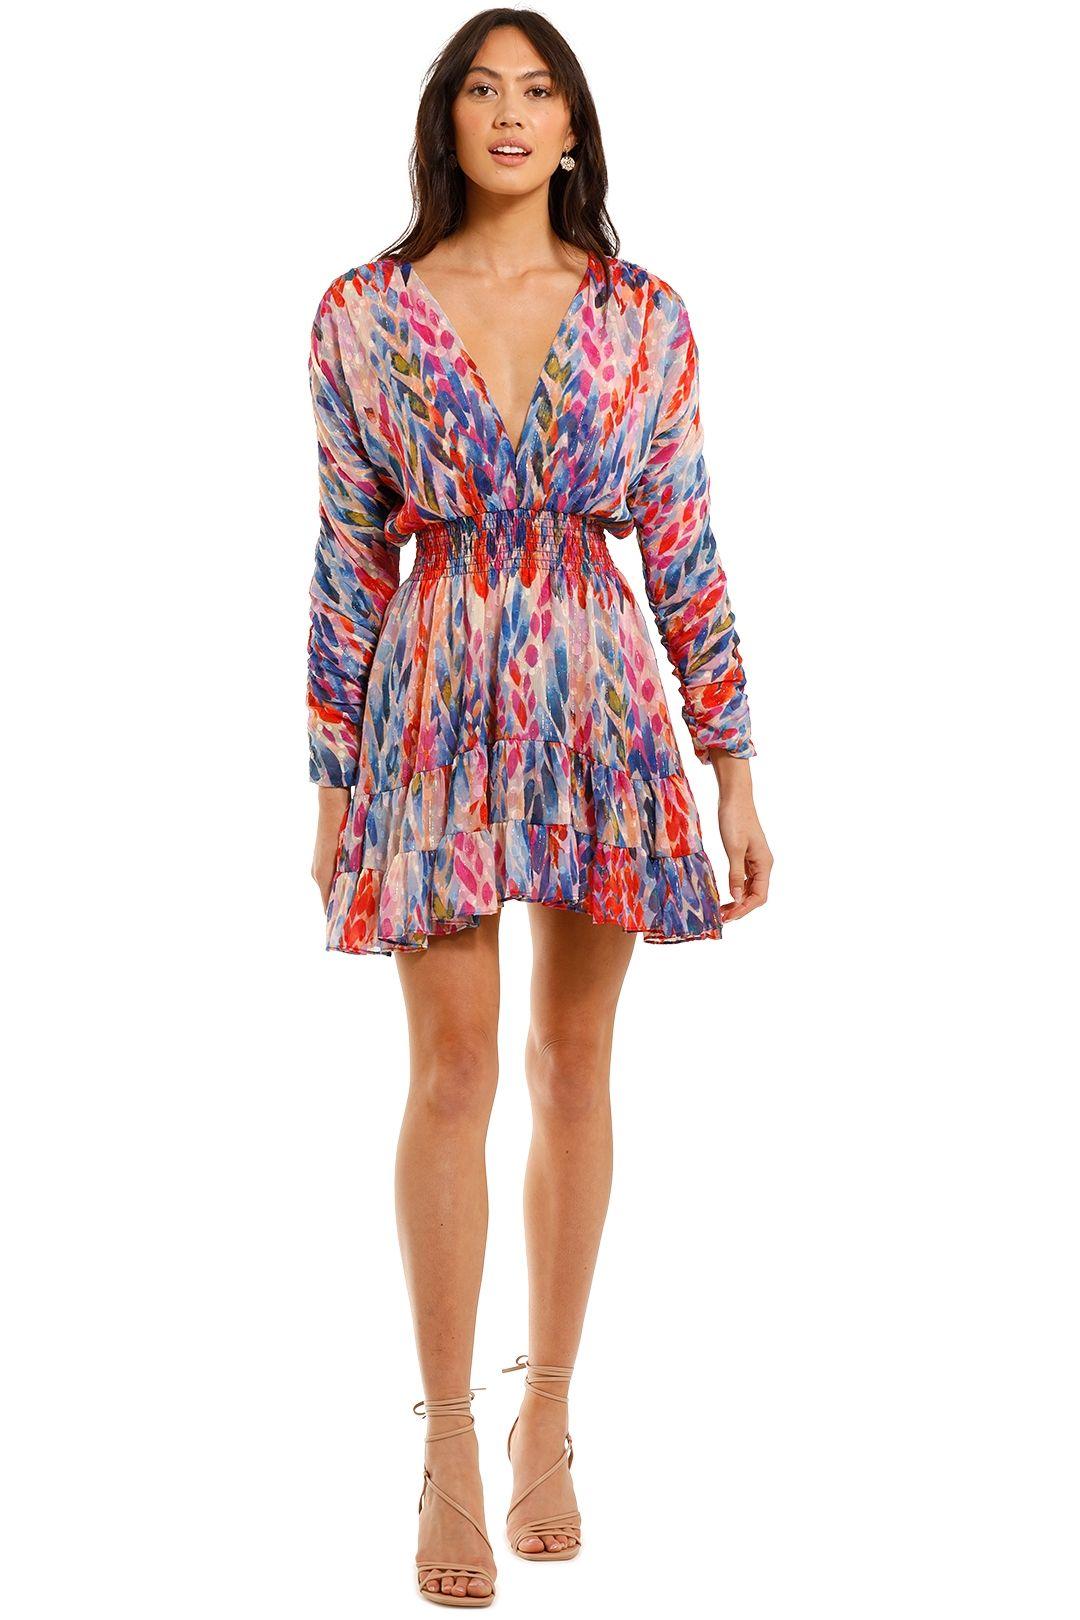 Misa LA Chiara Dress Mini Length